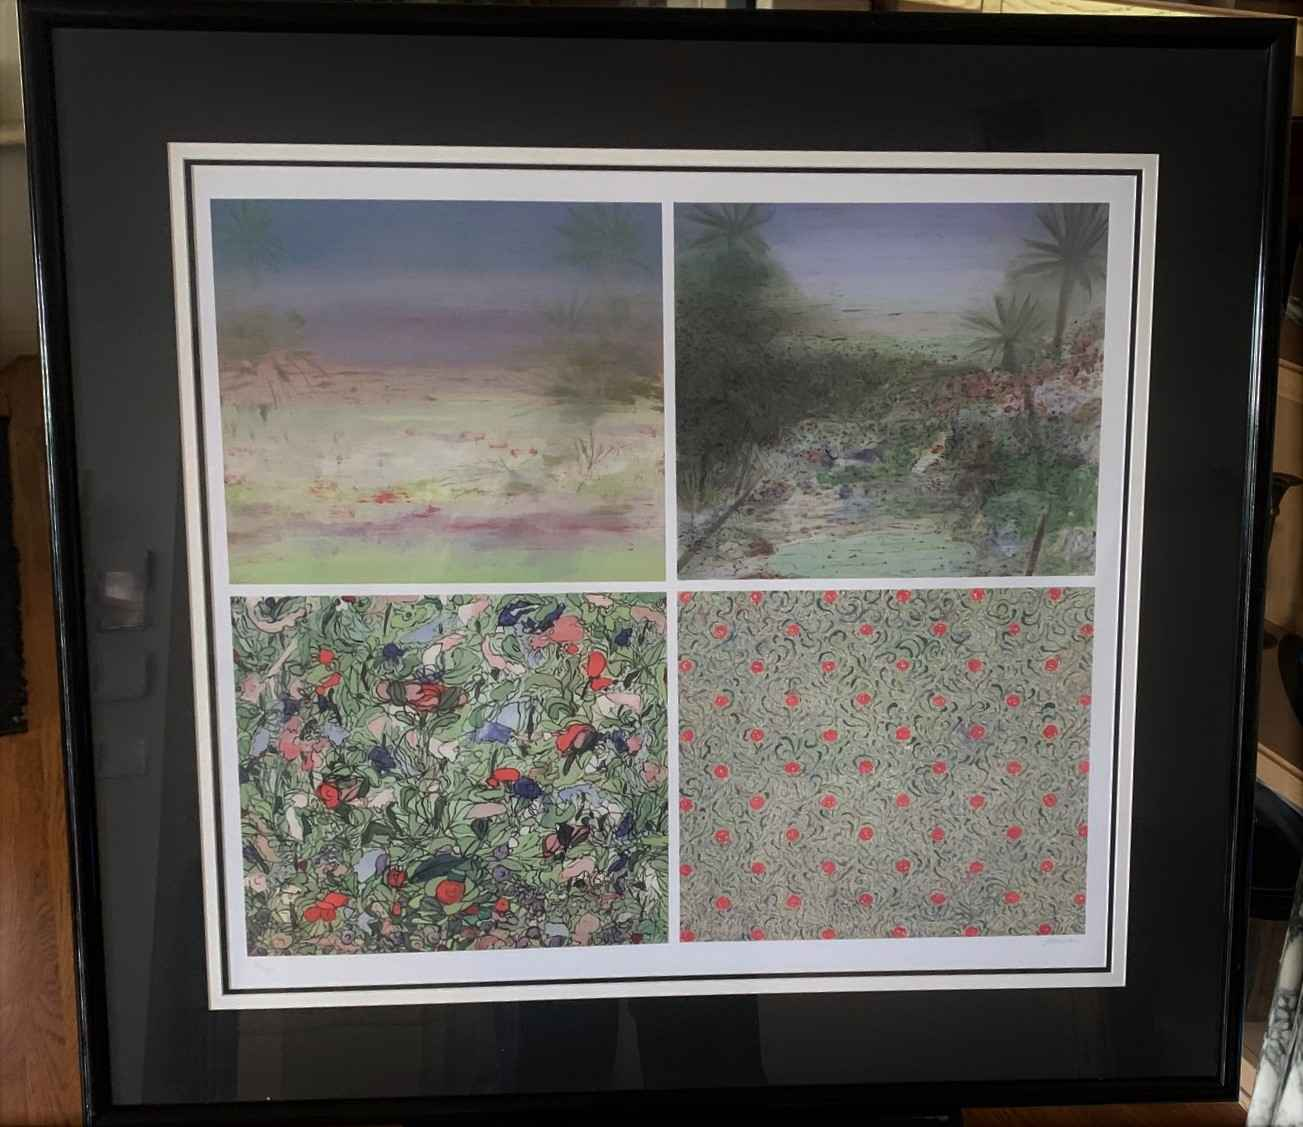 About Landscape II by  Farideh Golbahar - Masterpiece Online